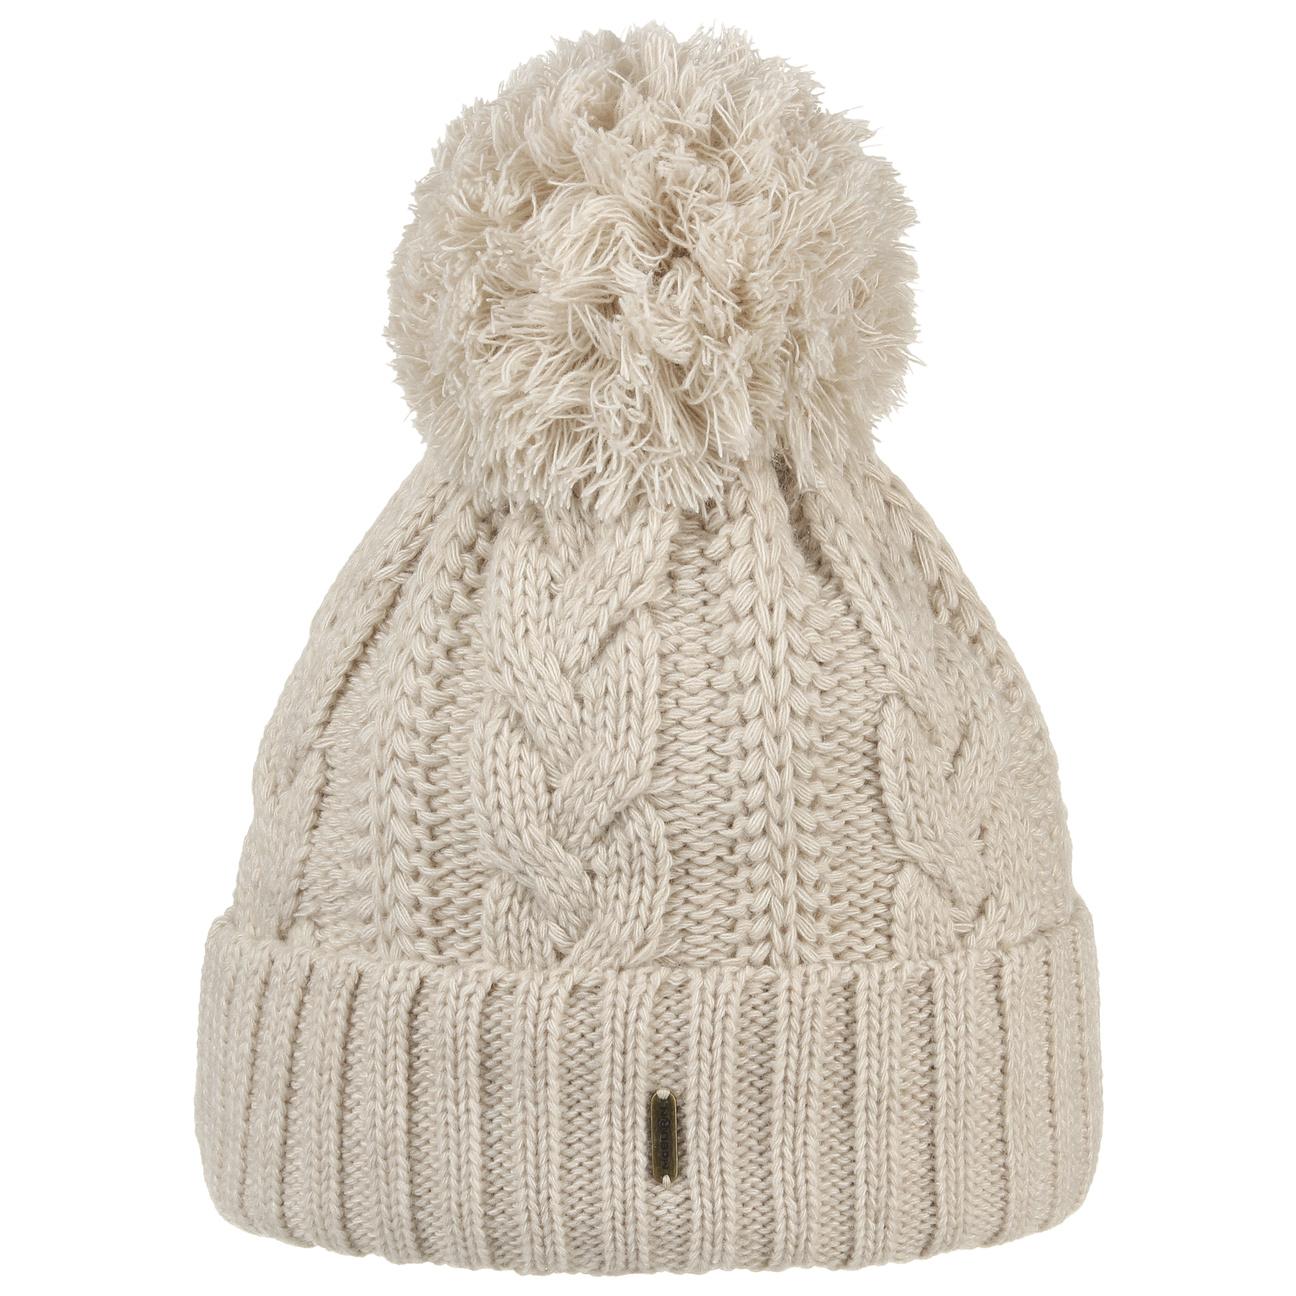 e8f50868b39 ... Giant Bobble Hat by McBURN - beige 1 ...